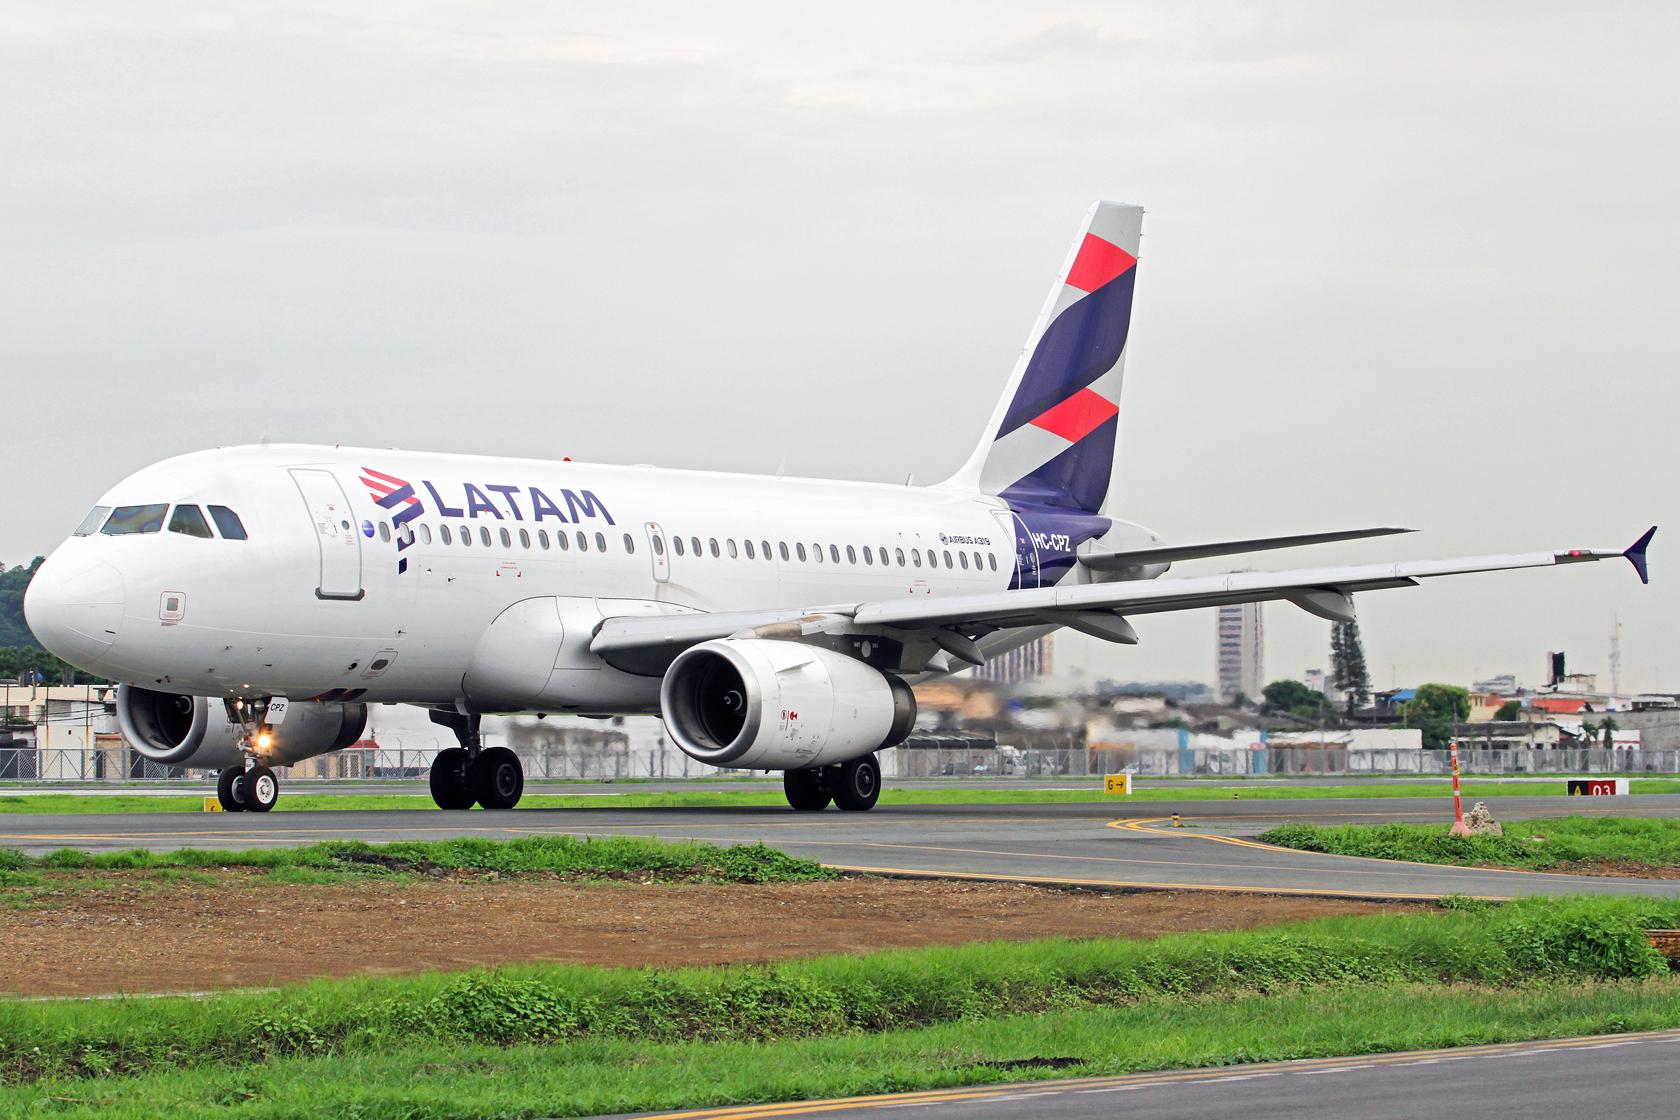 LATAM Airlines Ecuador Airbus A319-132 HC-CPZ - Die erste Maschine der LATAM Airlines Ecuador in den neuen Farben.